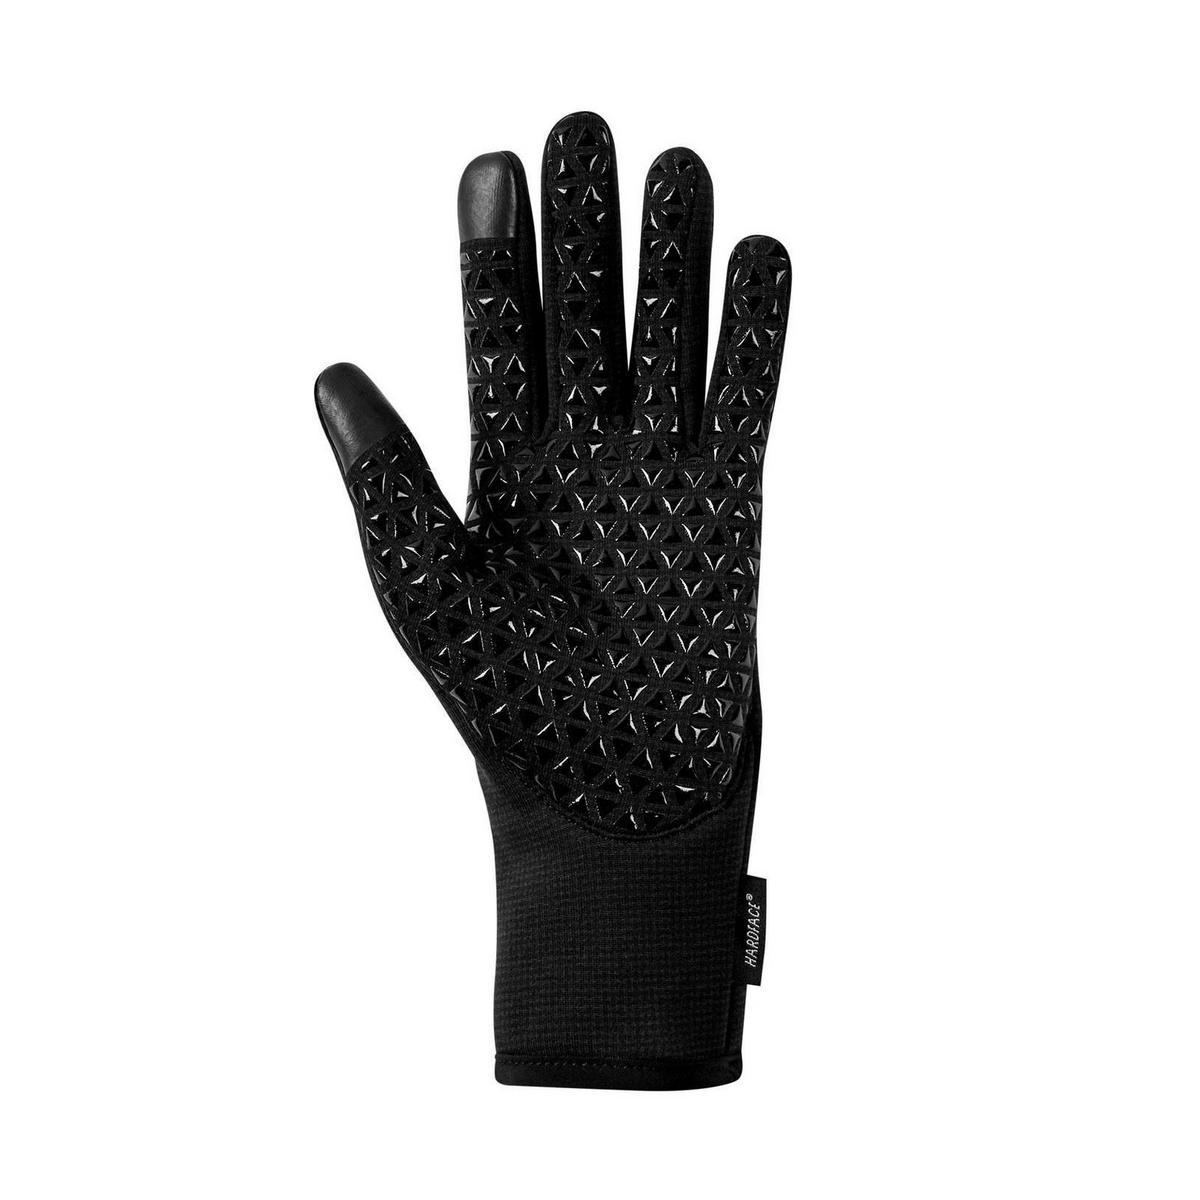 Rab Gloves Women's Phantom Grip Black